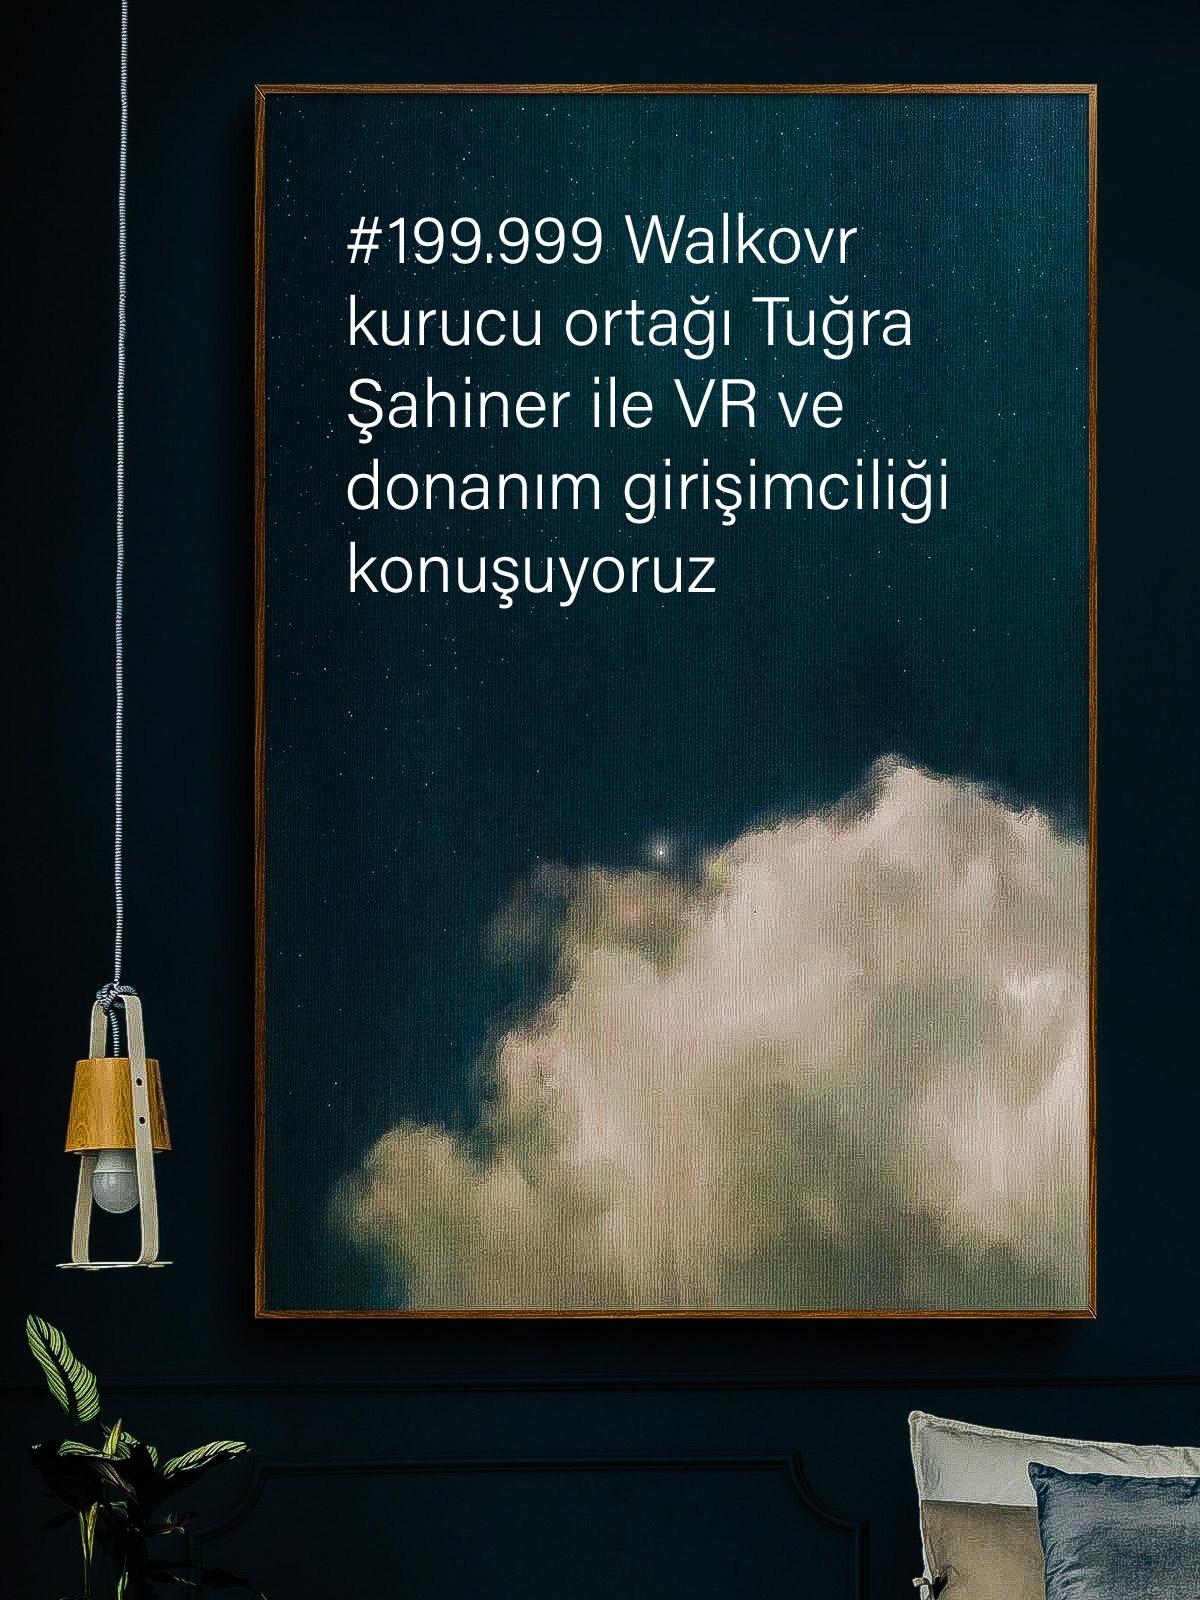 PSX_20190605_112149.jpg